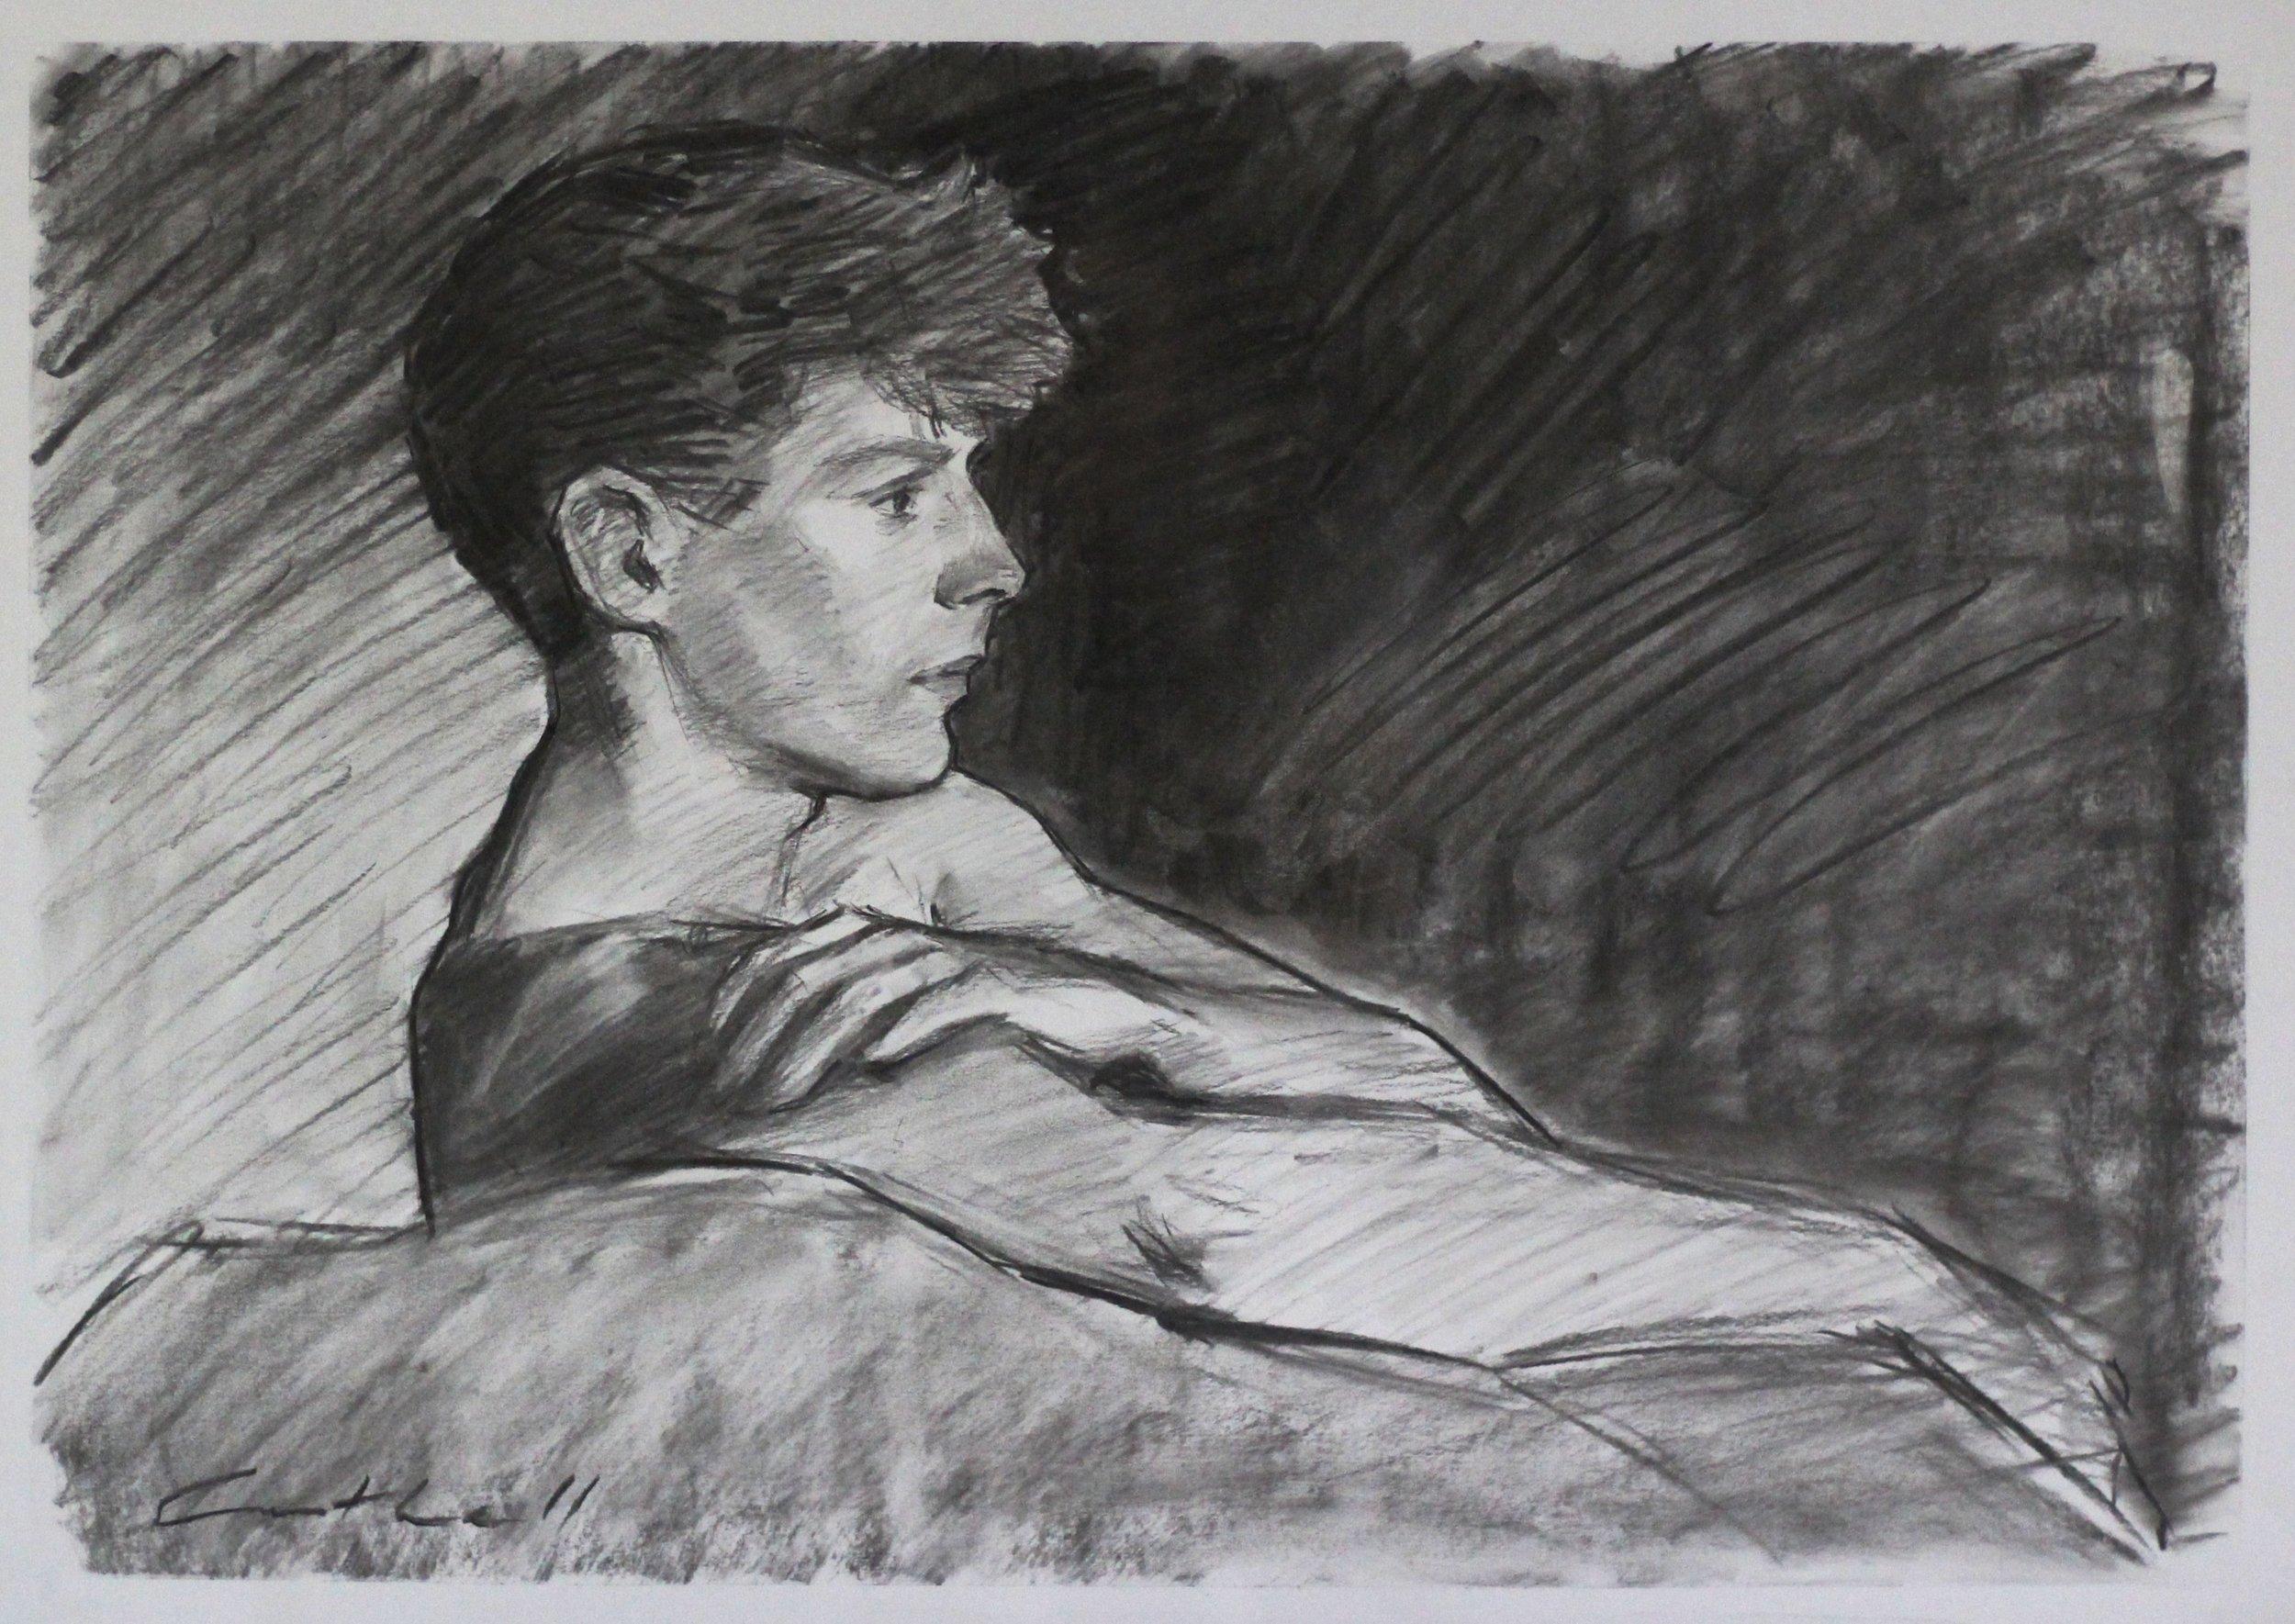 Henrik, Charcoal on Paper, 42 x 60cm, 2017